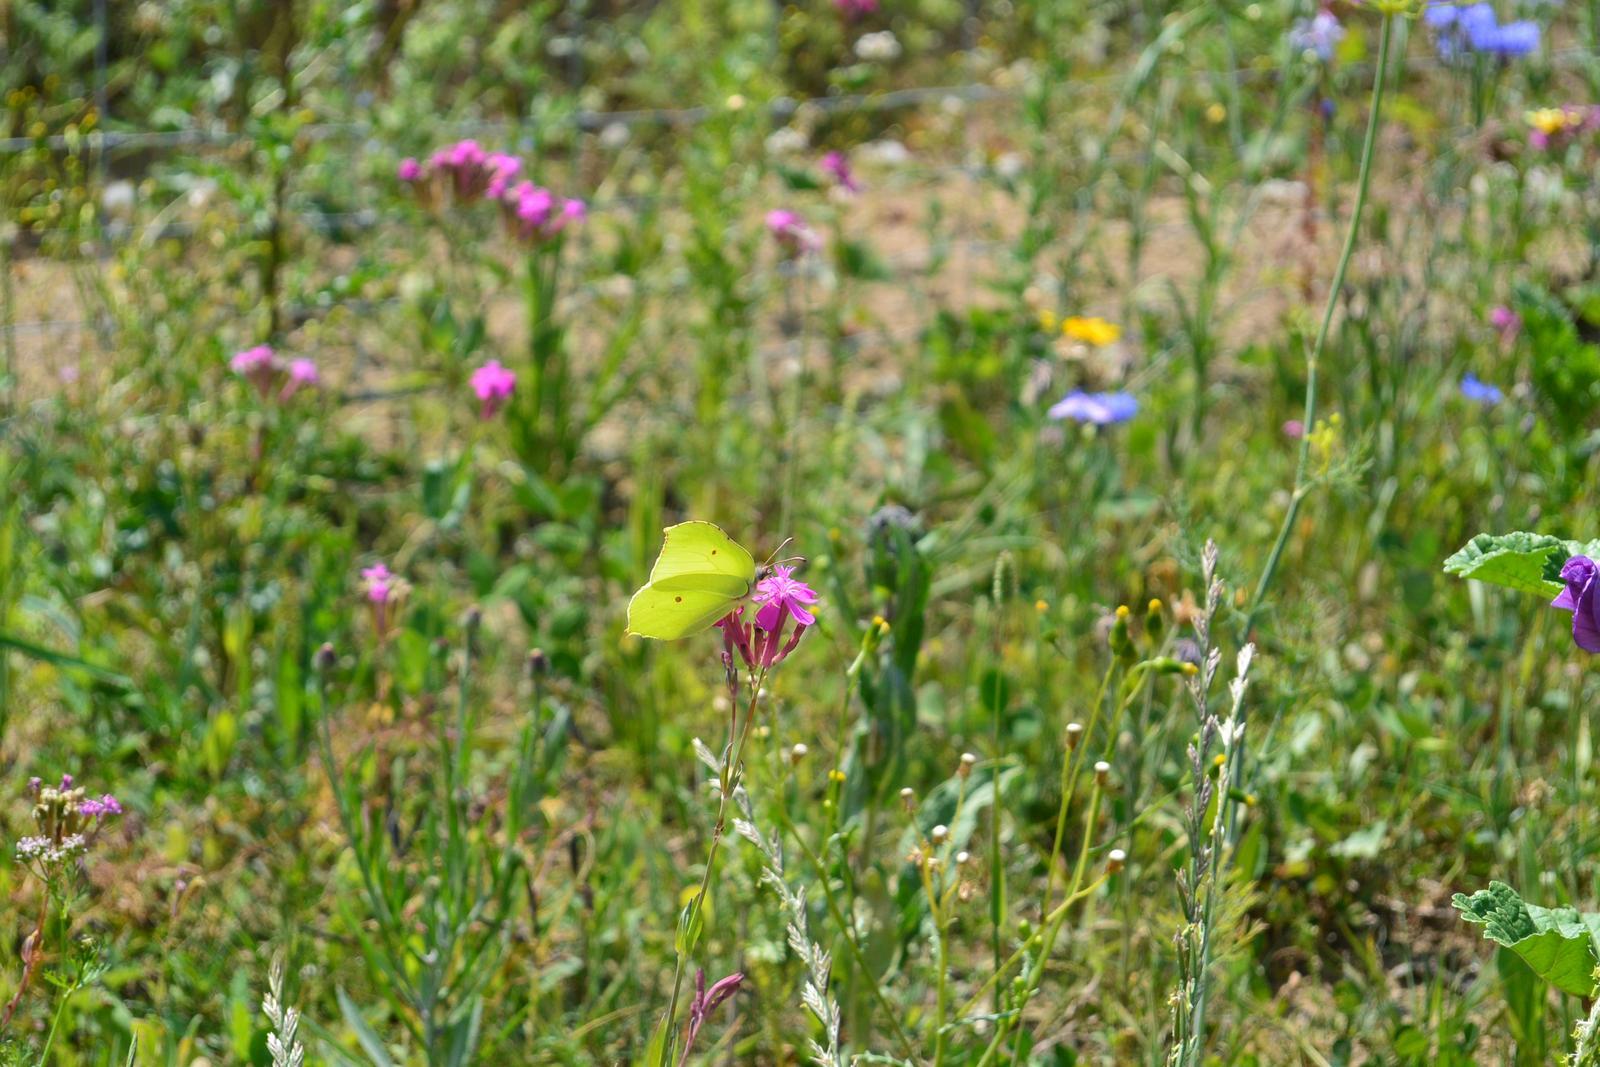 Motýlí zahrada 2019-2020 - Žluťásek řešetlákový